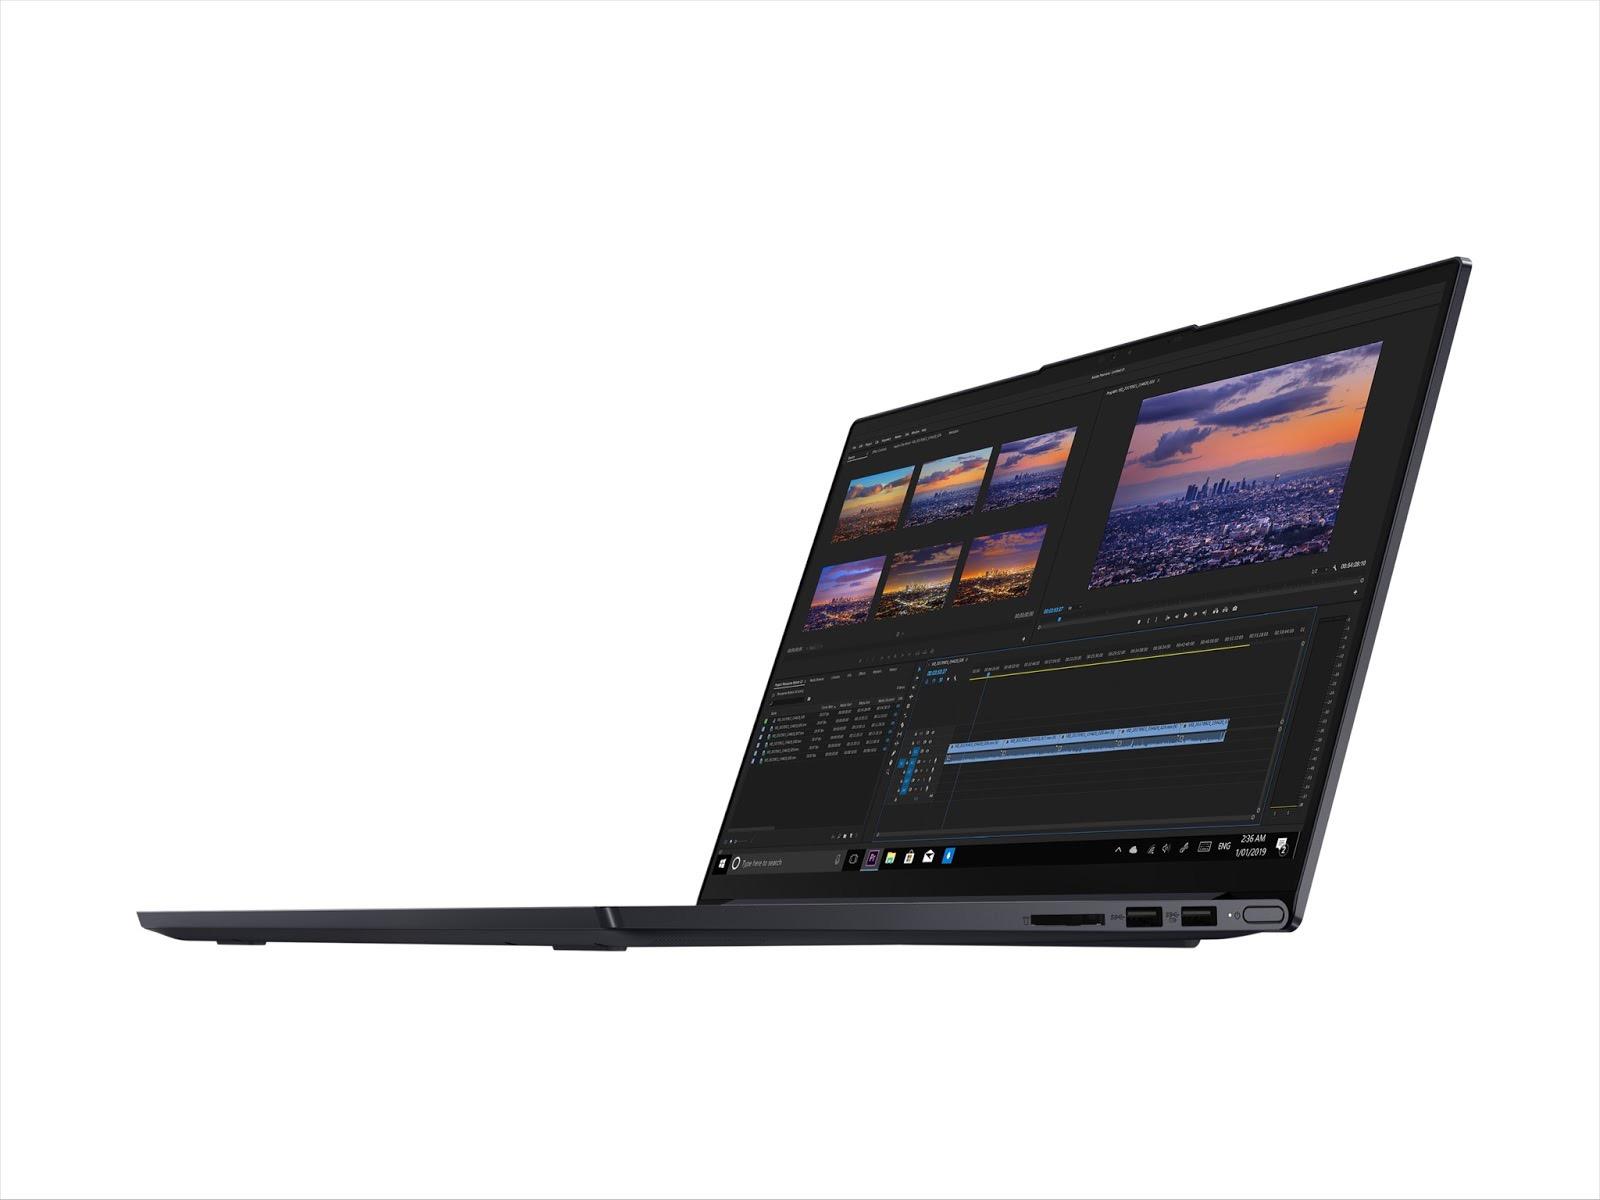 Фото 3. Ноутбук Lenovo YOGA Slim 7i 15IIL05 Slate Grey (82AA0032RE)